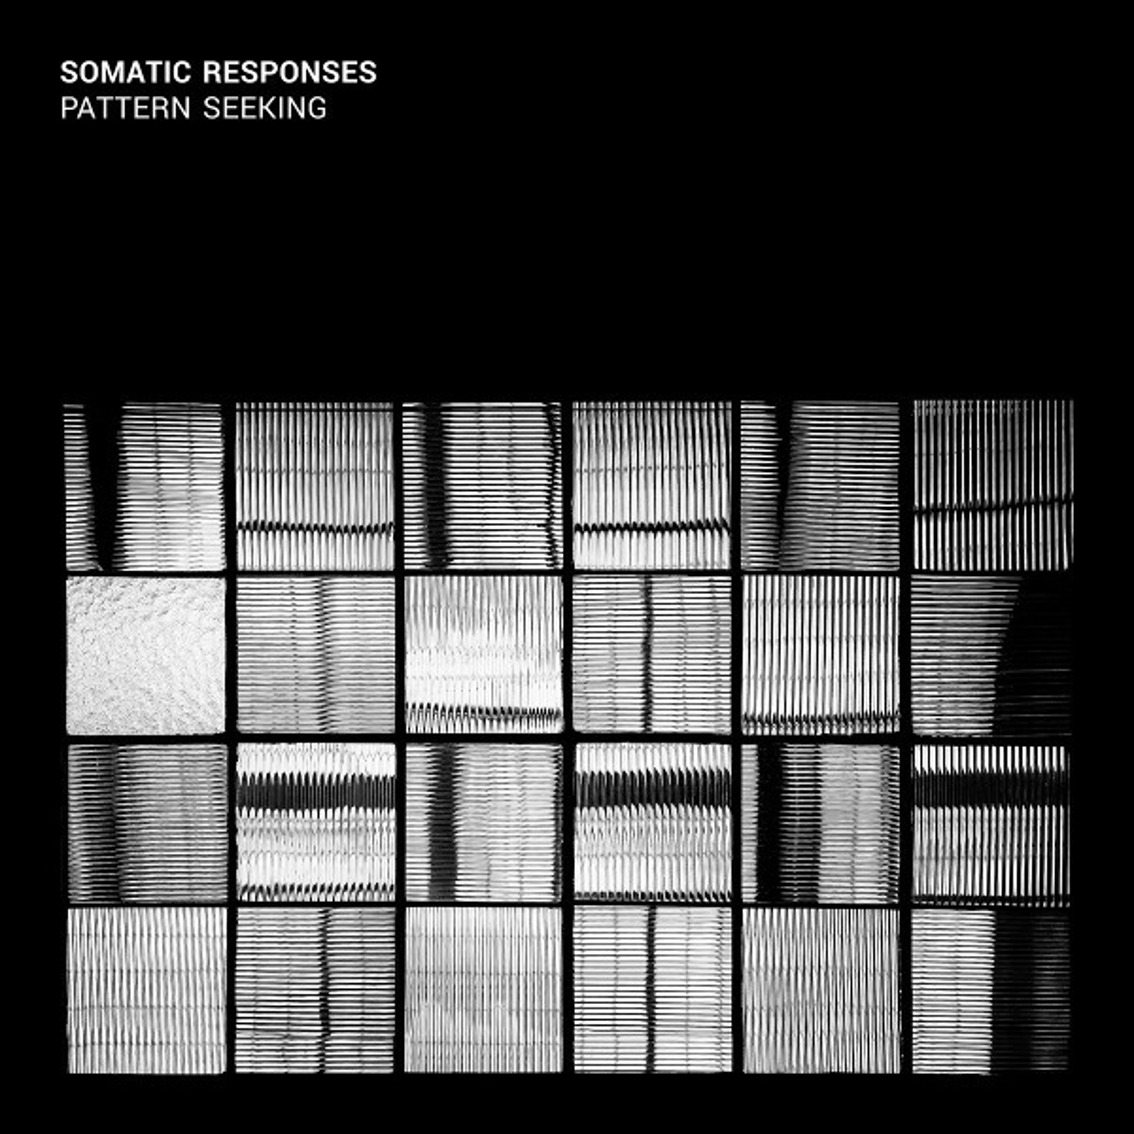 Somatic Responses choose for'Pattern Seeking'